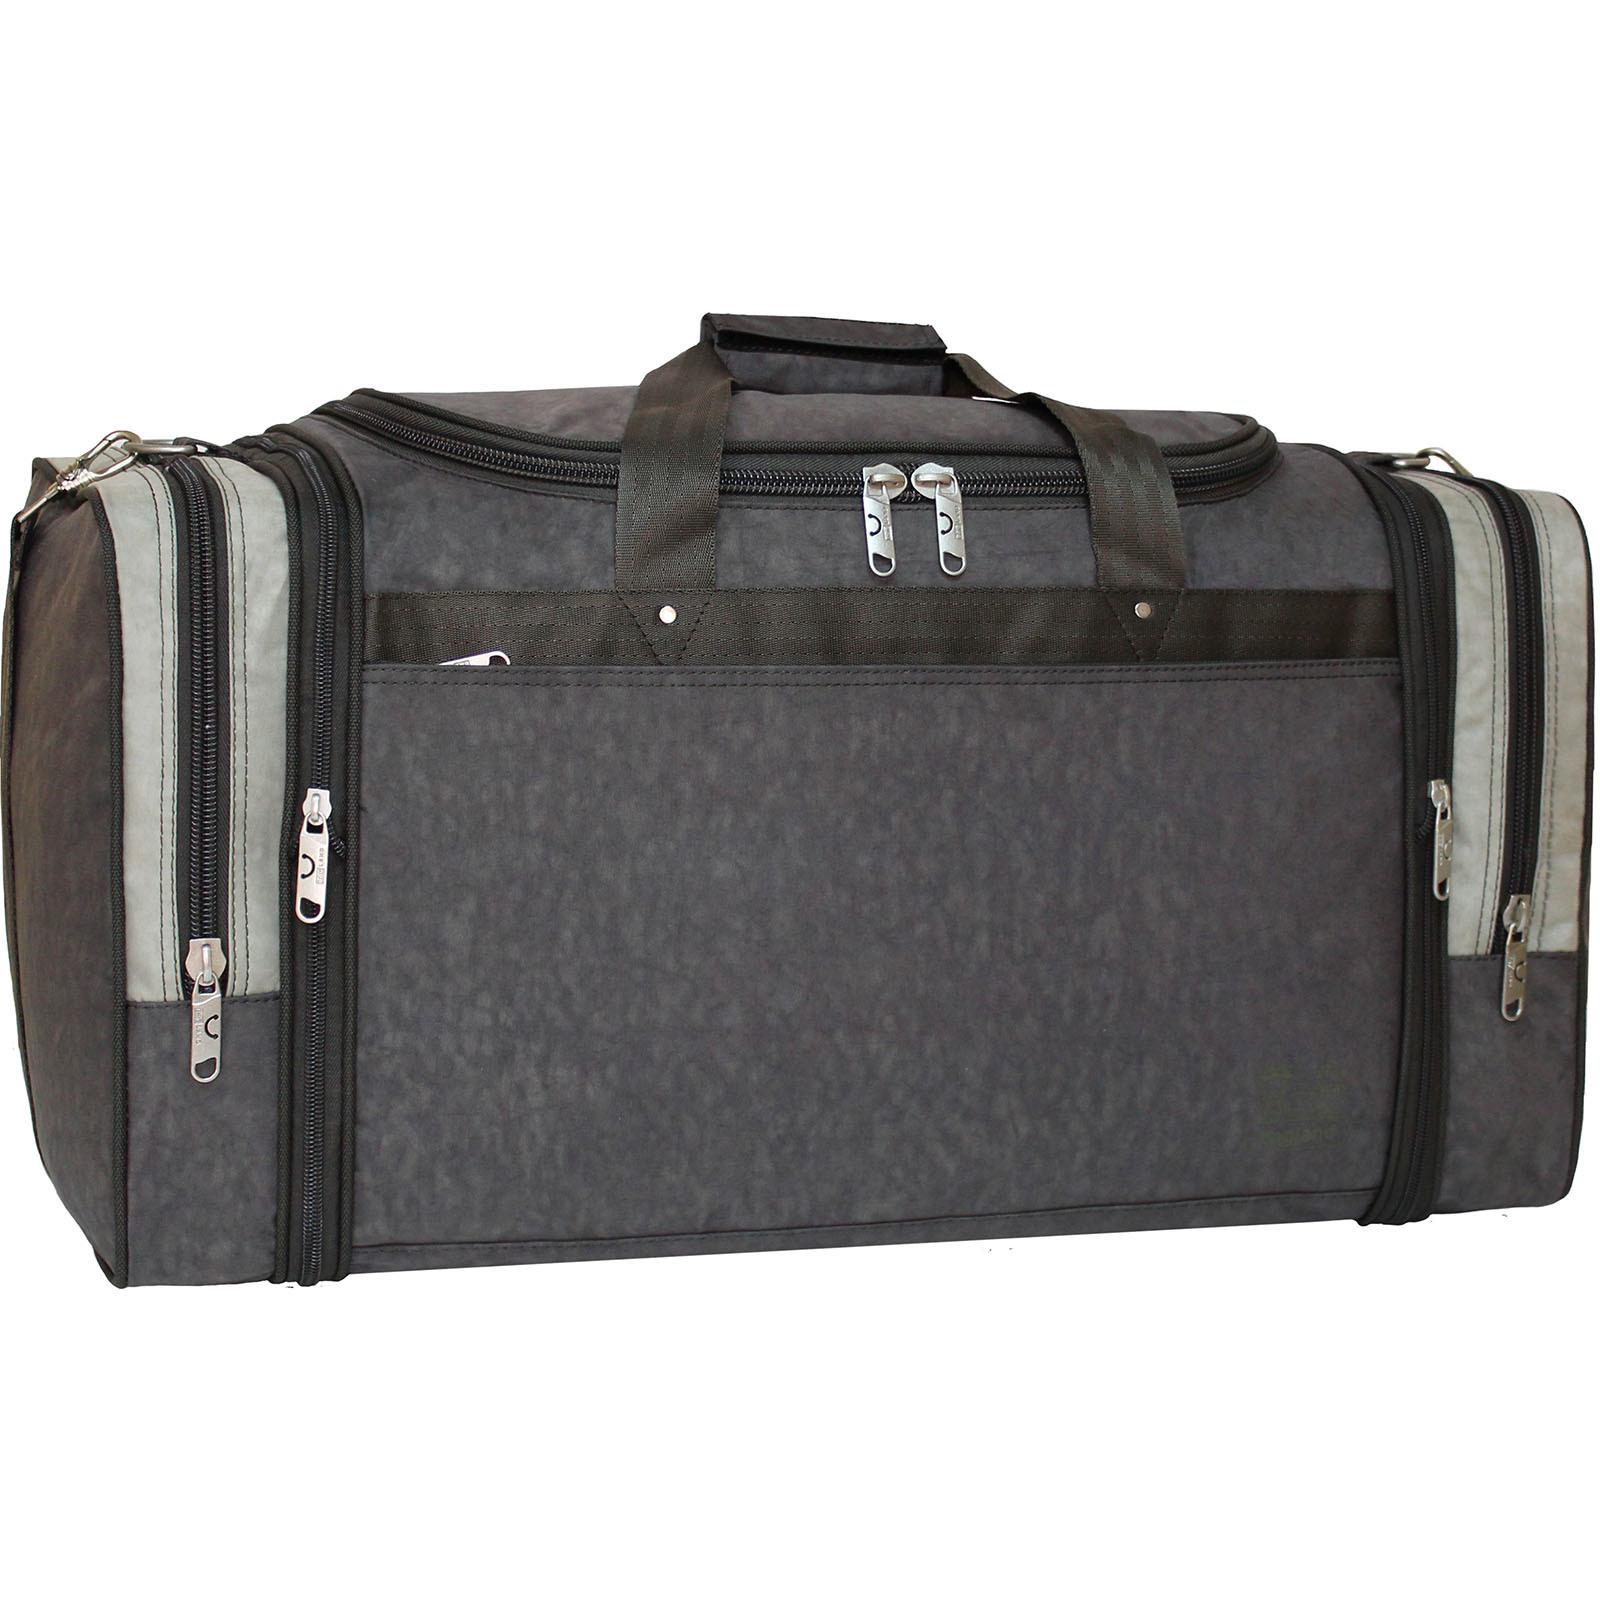 Дорожные сумки Спортивная сумка Bagland Мюнхен 59 л. Хаки/оливка (0032570) IMG_1174_32570_.JPG